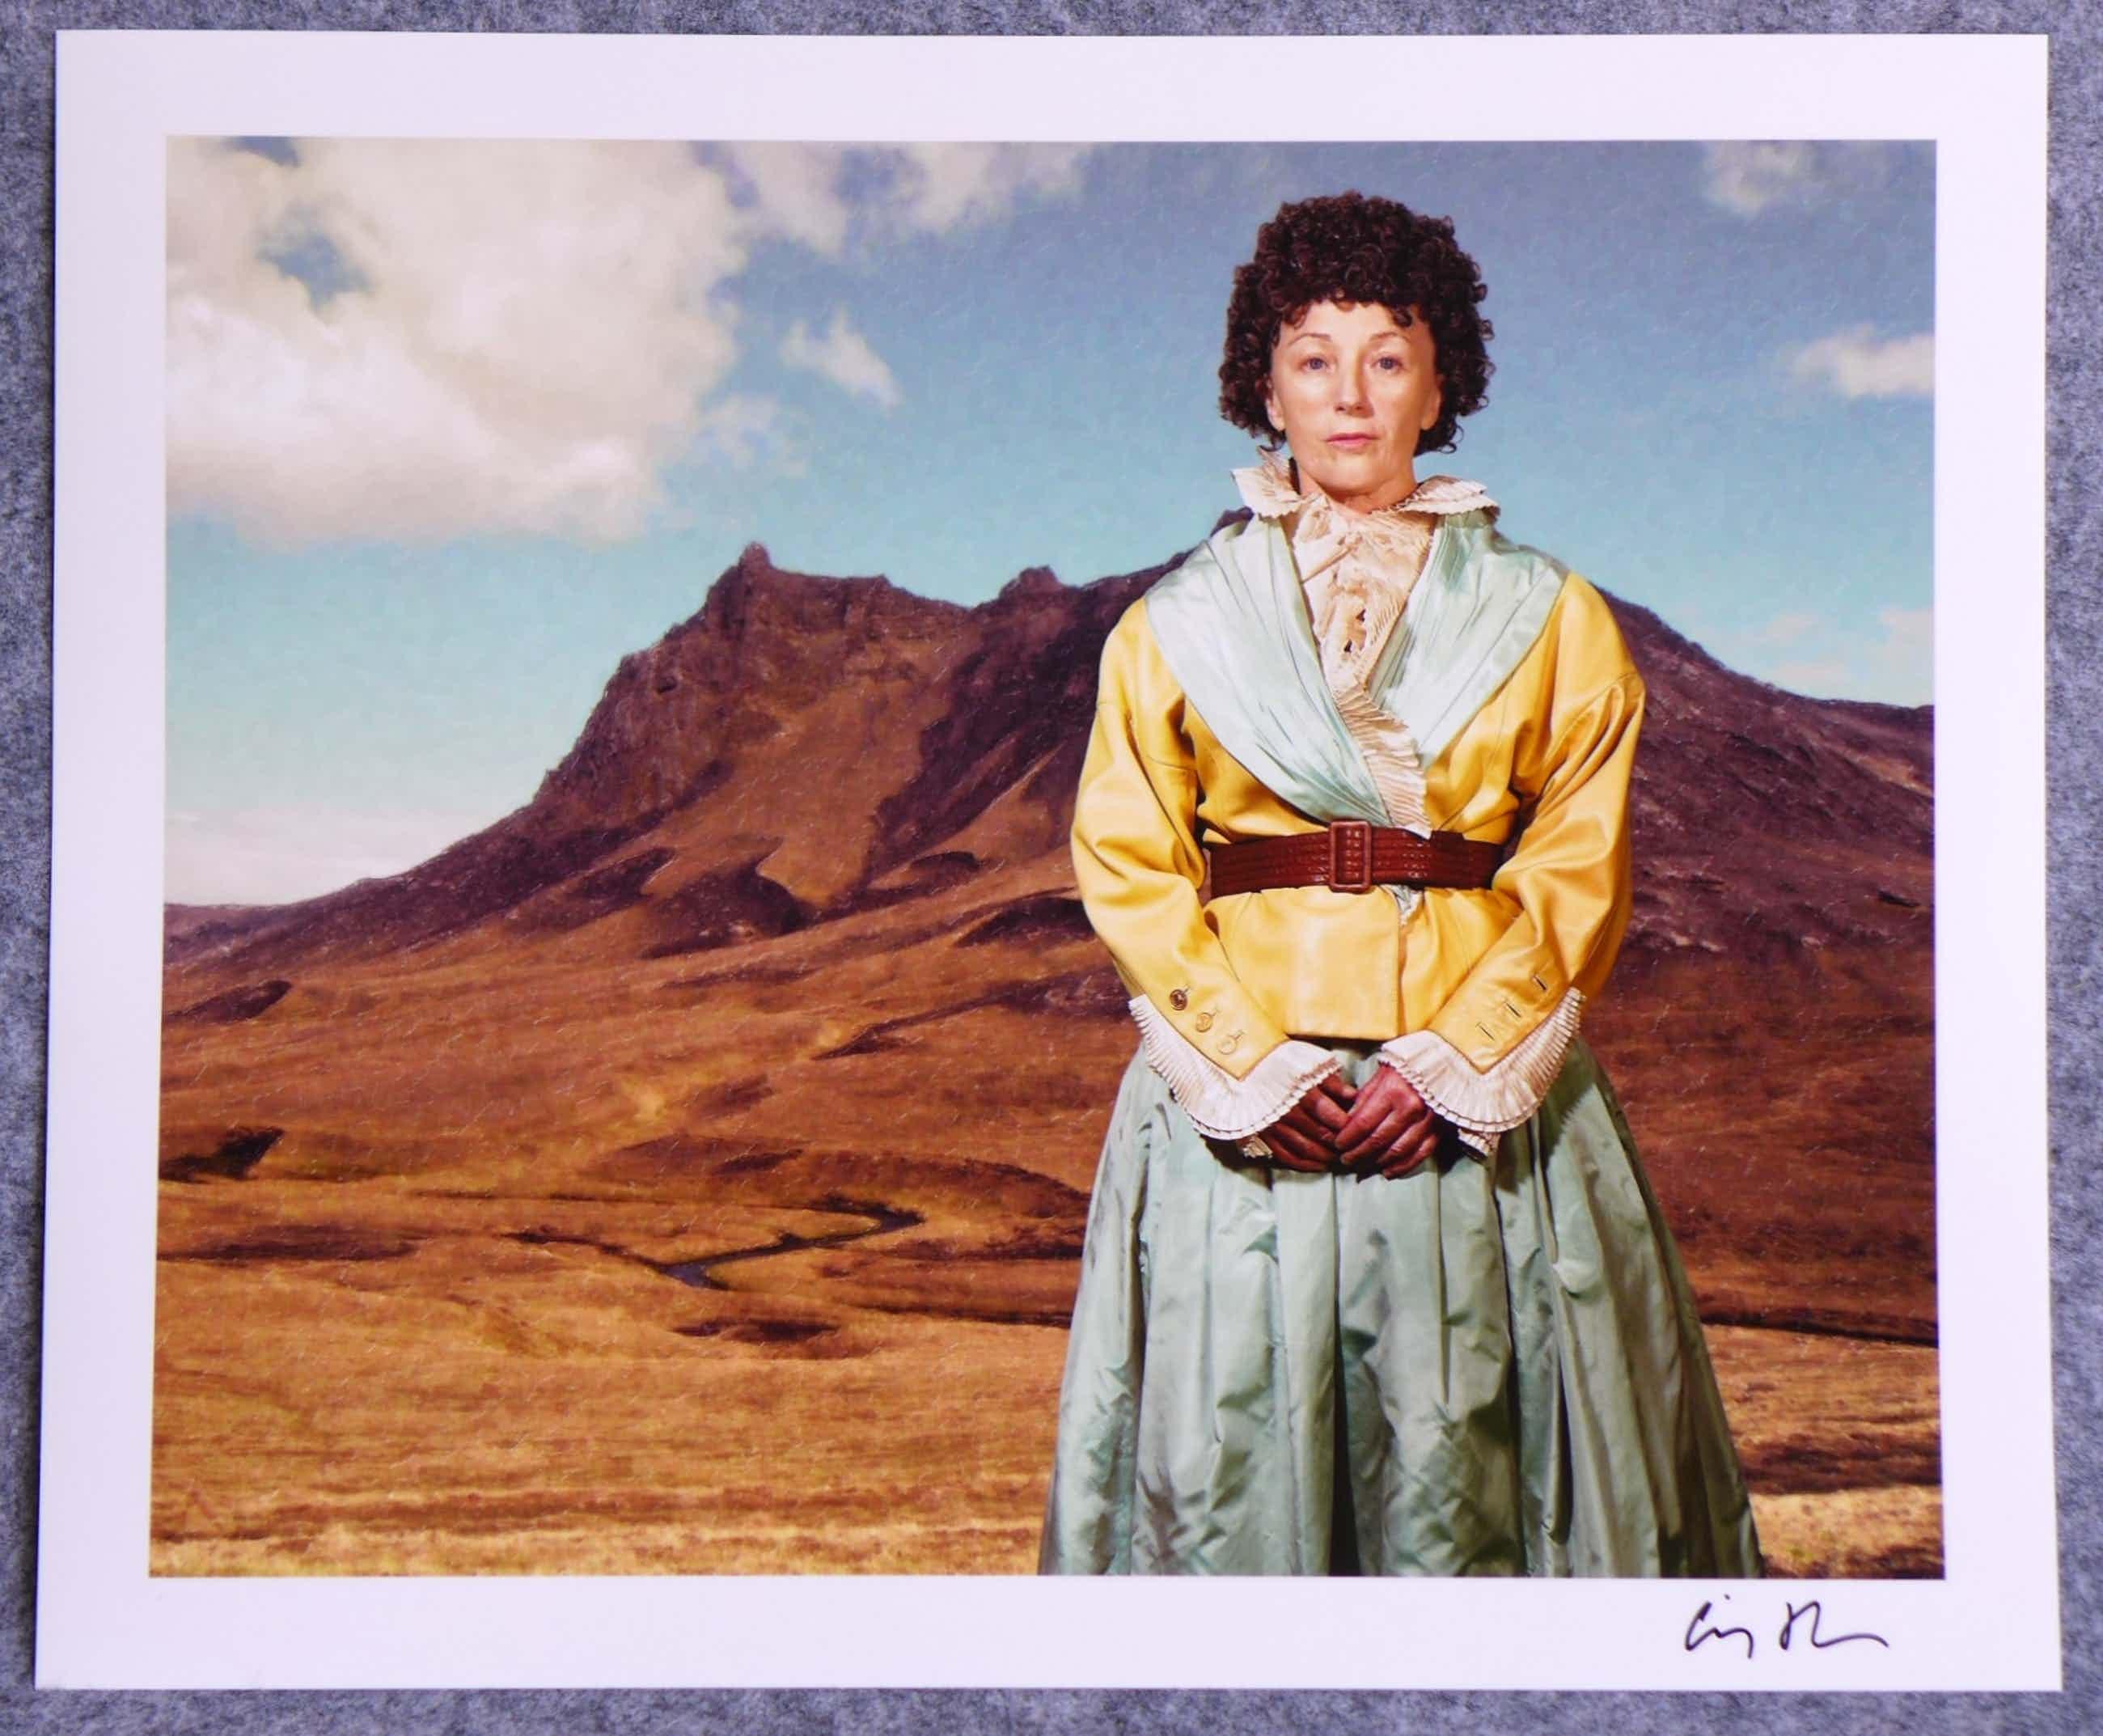 Cindy Sherman - Autogramm auf Fotografie Untitled 540 kopen? Bied vanaf 49!